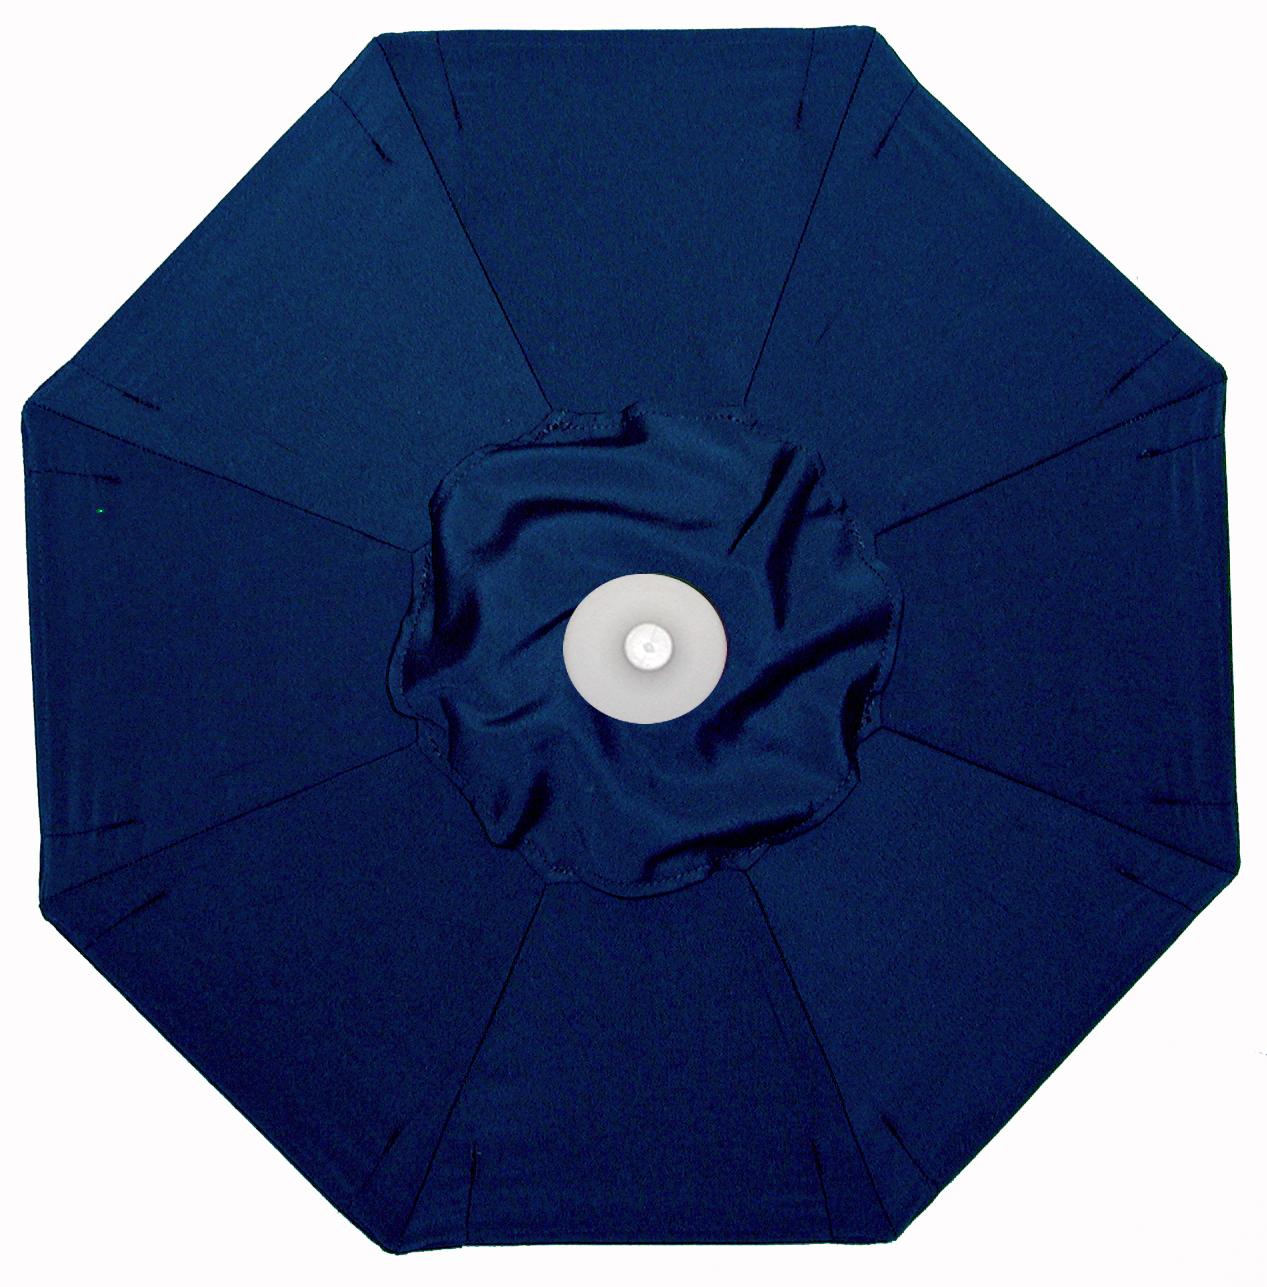 treasure garden 7 5 39 replacement umbrella canopy patio umbrella store. Black Bedroom Furniture Sets. Home Design Ideas